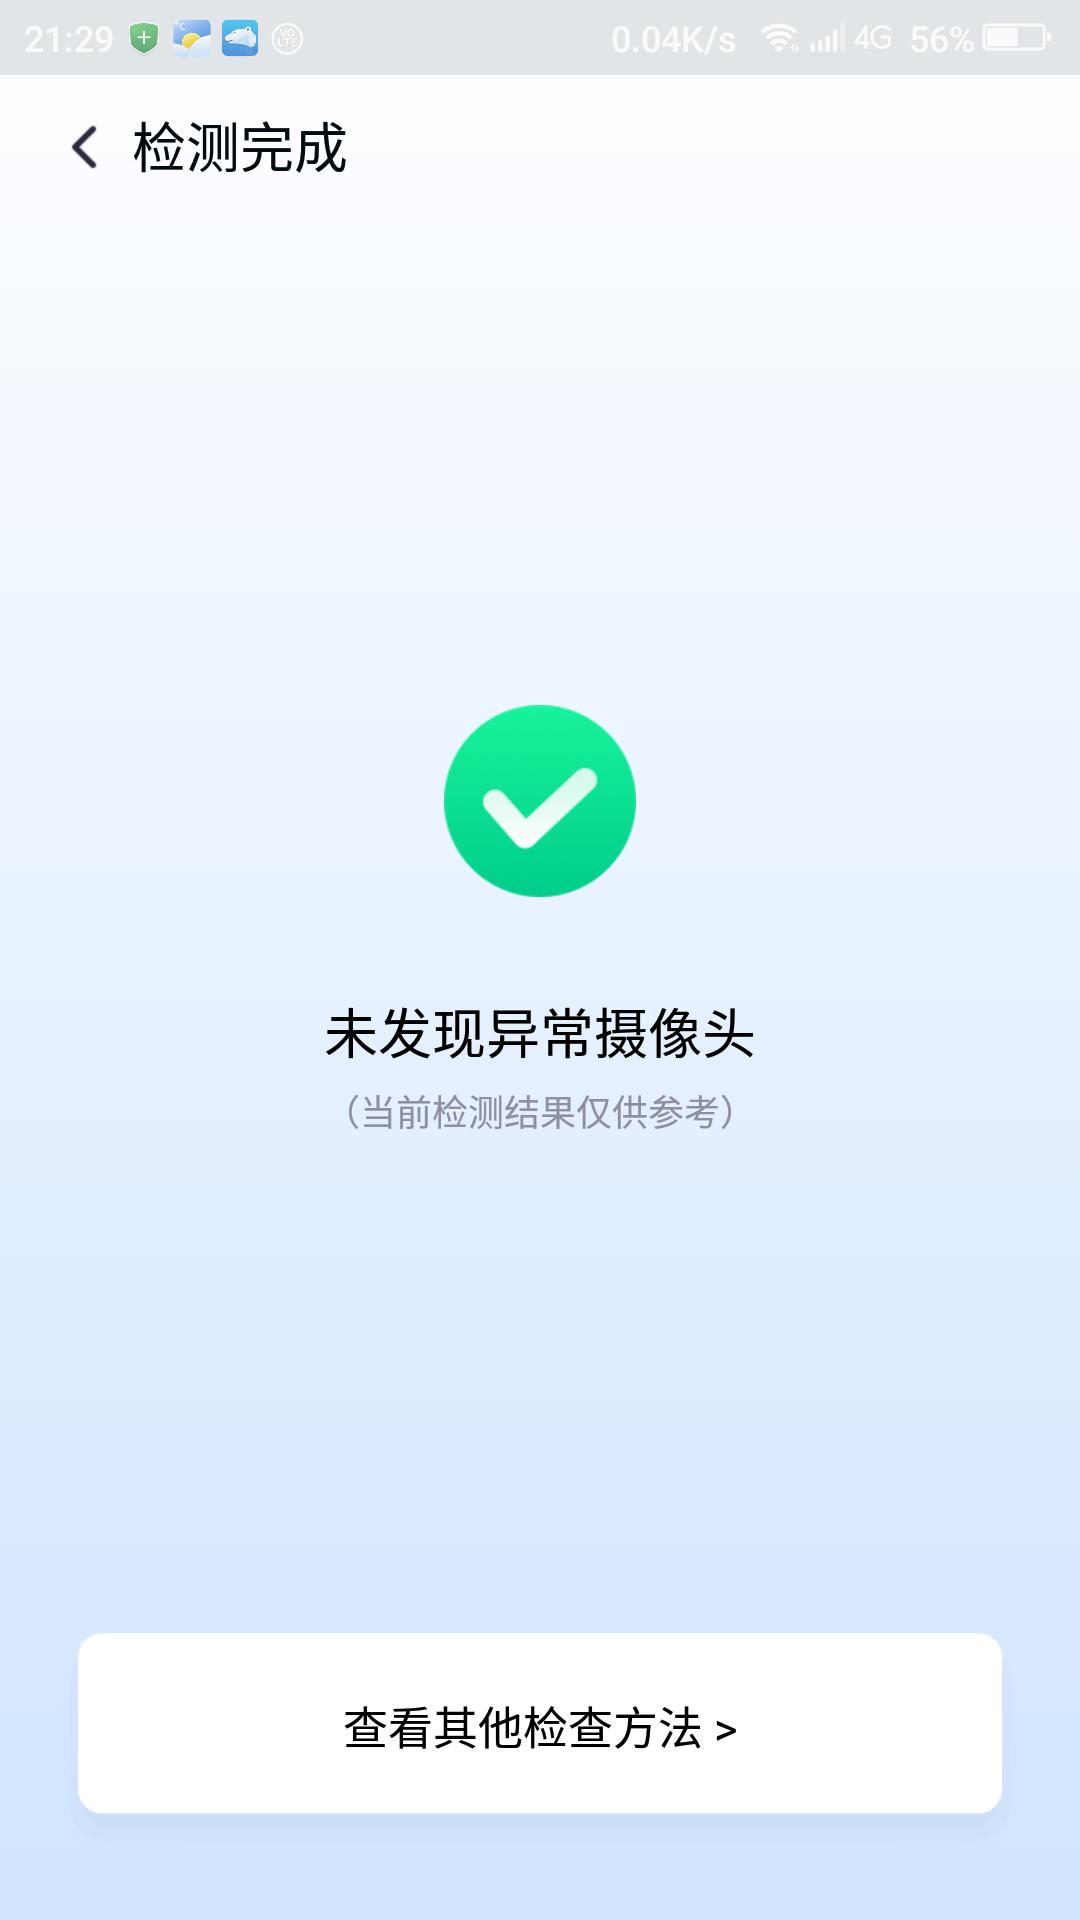 Screenshot_2020-01-20-21-29-46.png